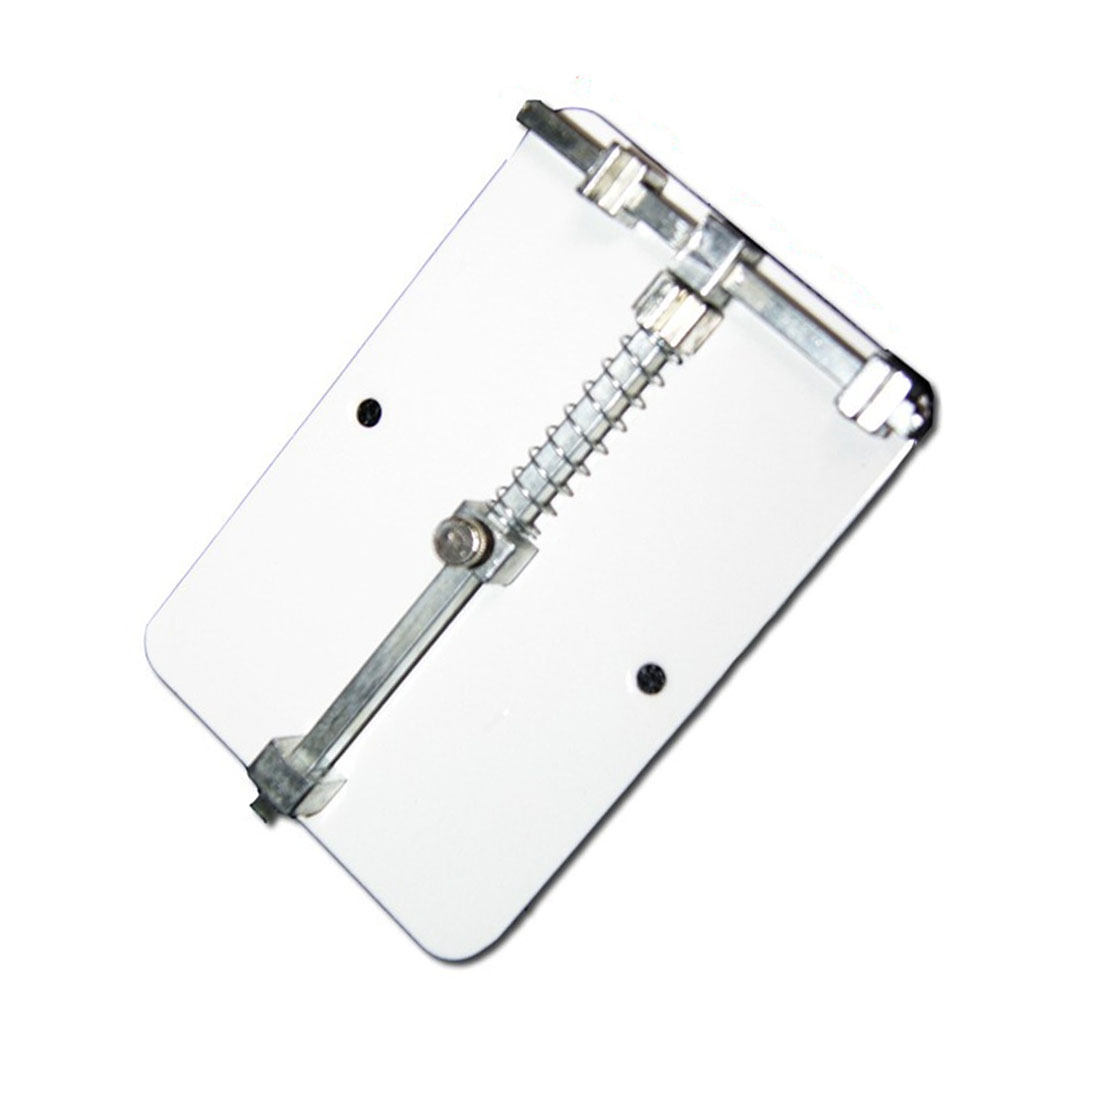 все цены на 1pc High Quality 8*12cm Fixture Motherboard PCB Holder For Mobile Phone Board Repair Tool онлайн